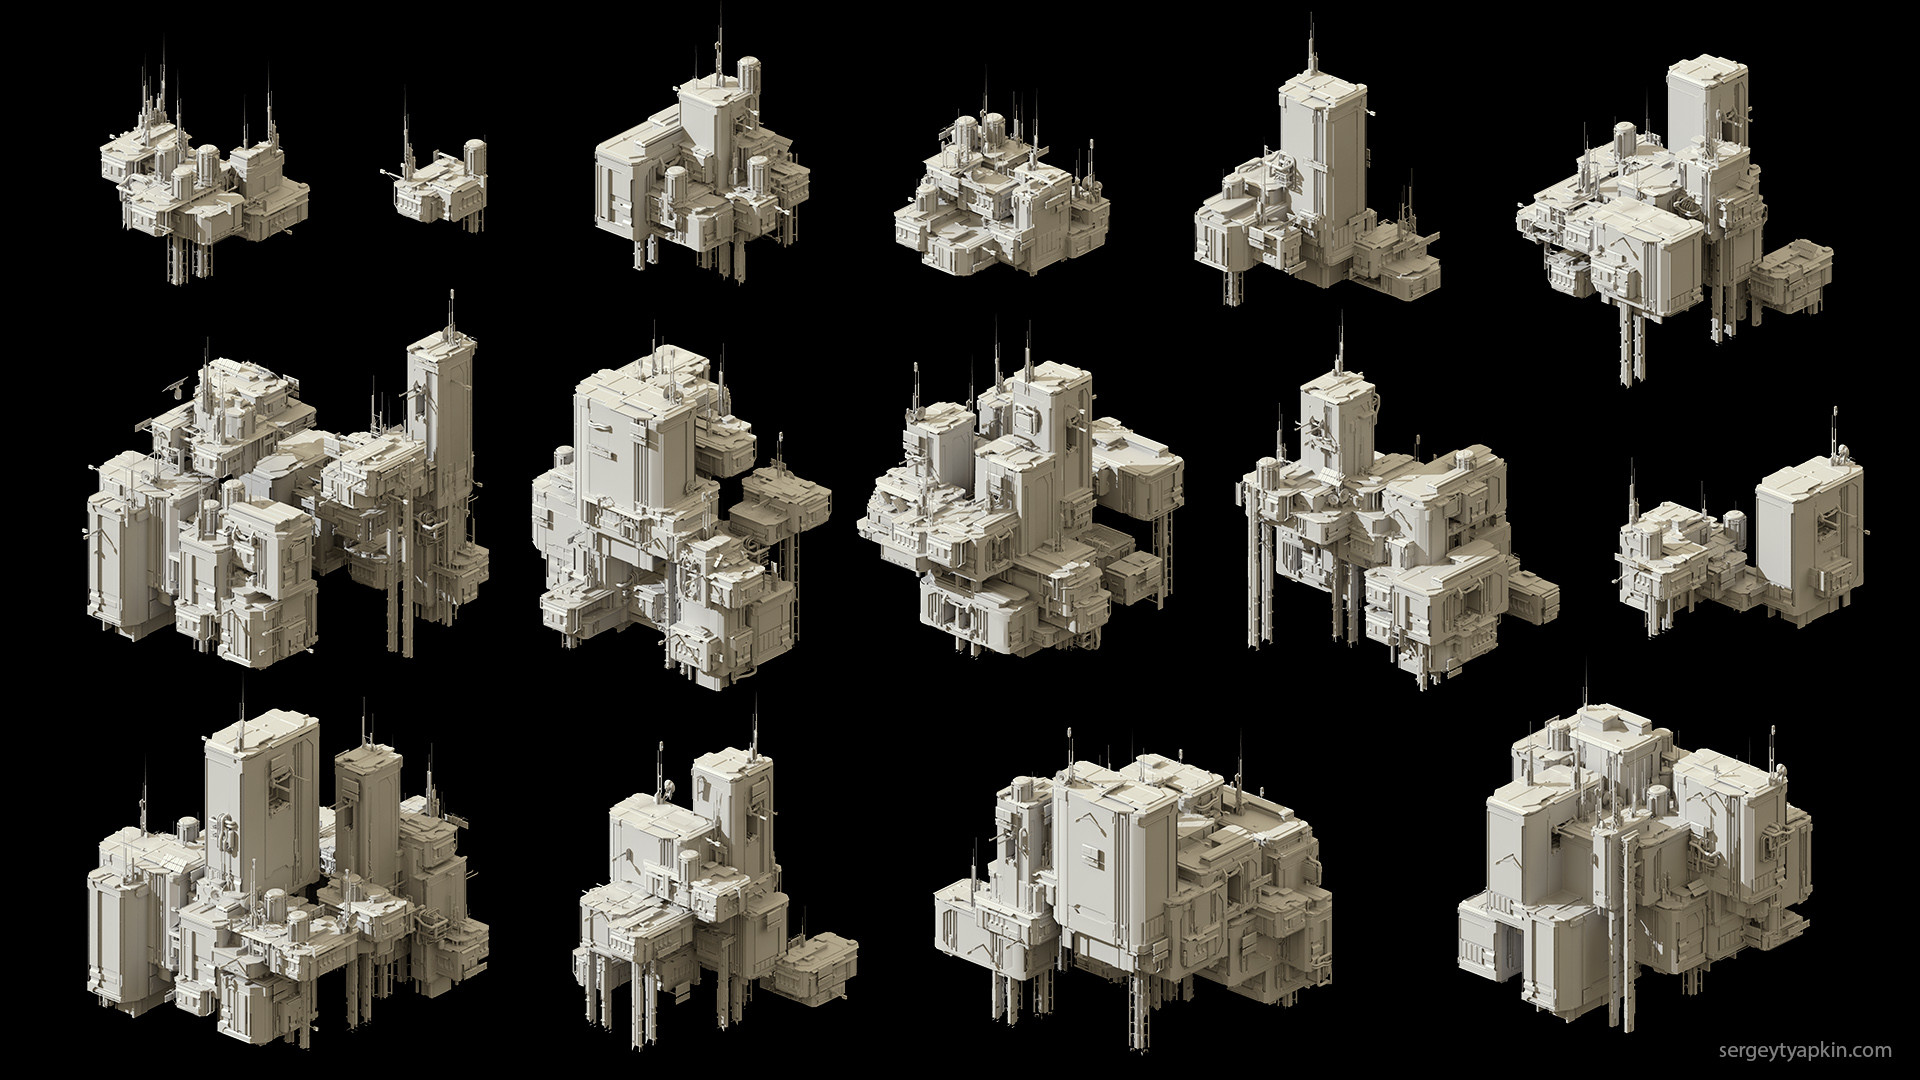 Sergey tyapkin buildings render 1